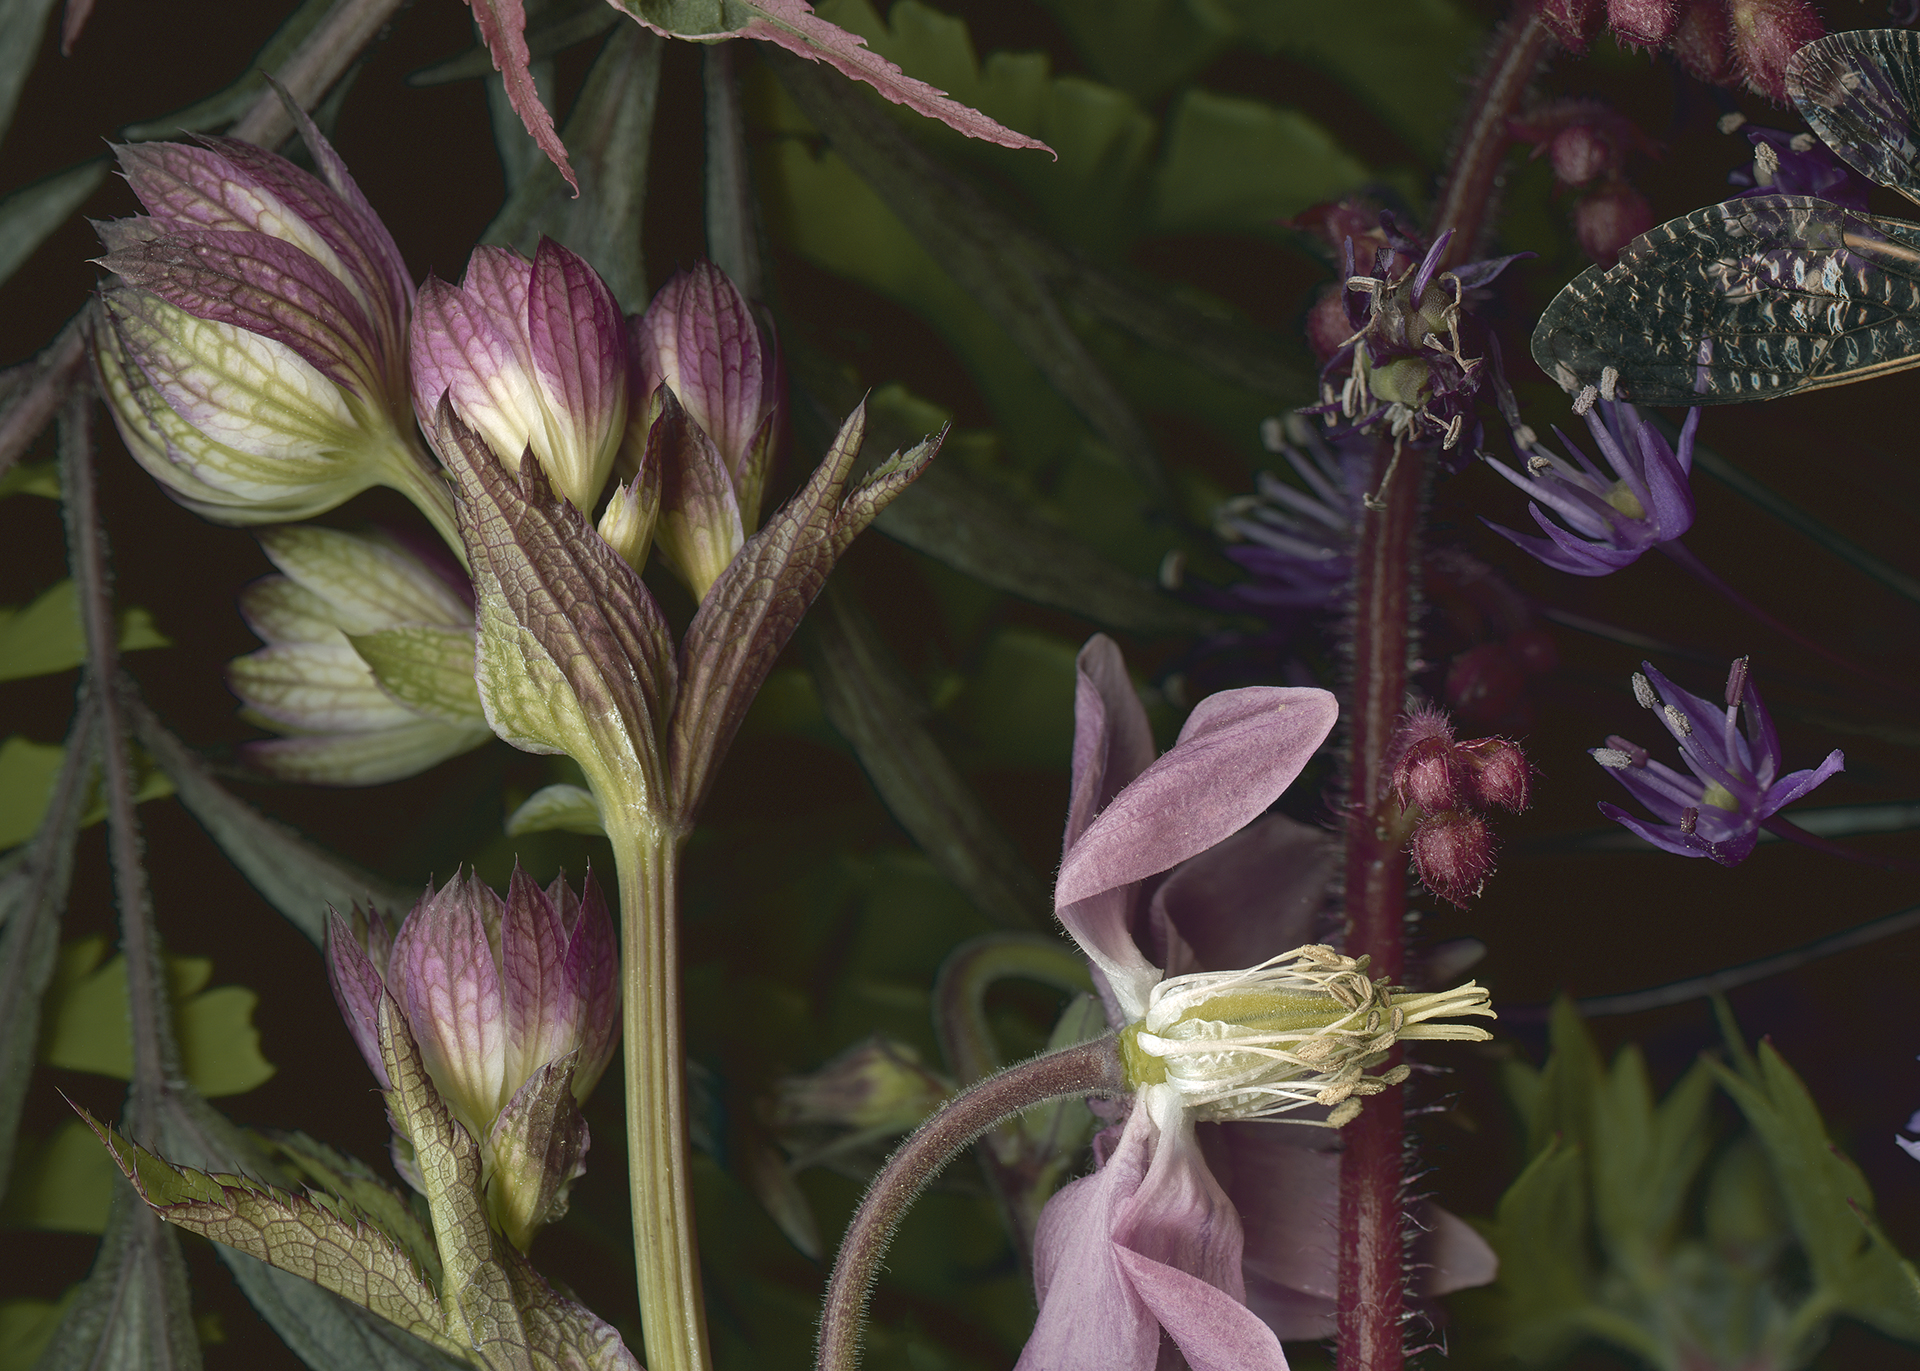 detail of Cinnabar Moth and Columbines